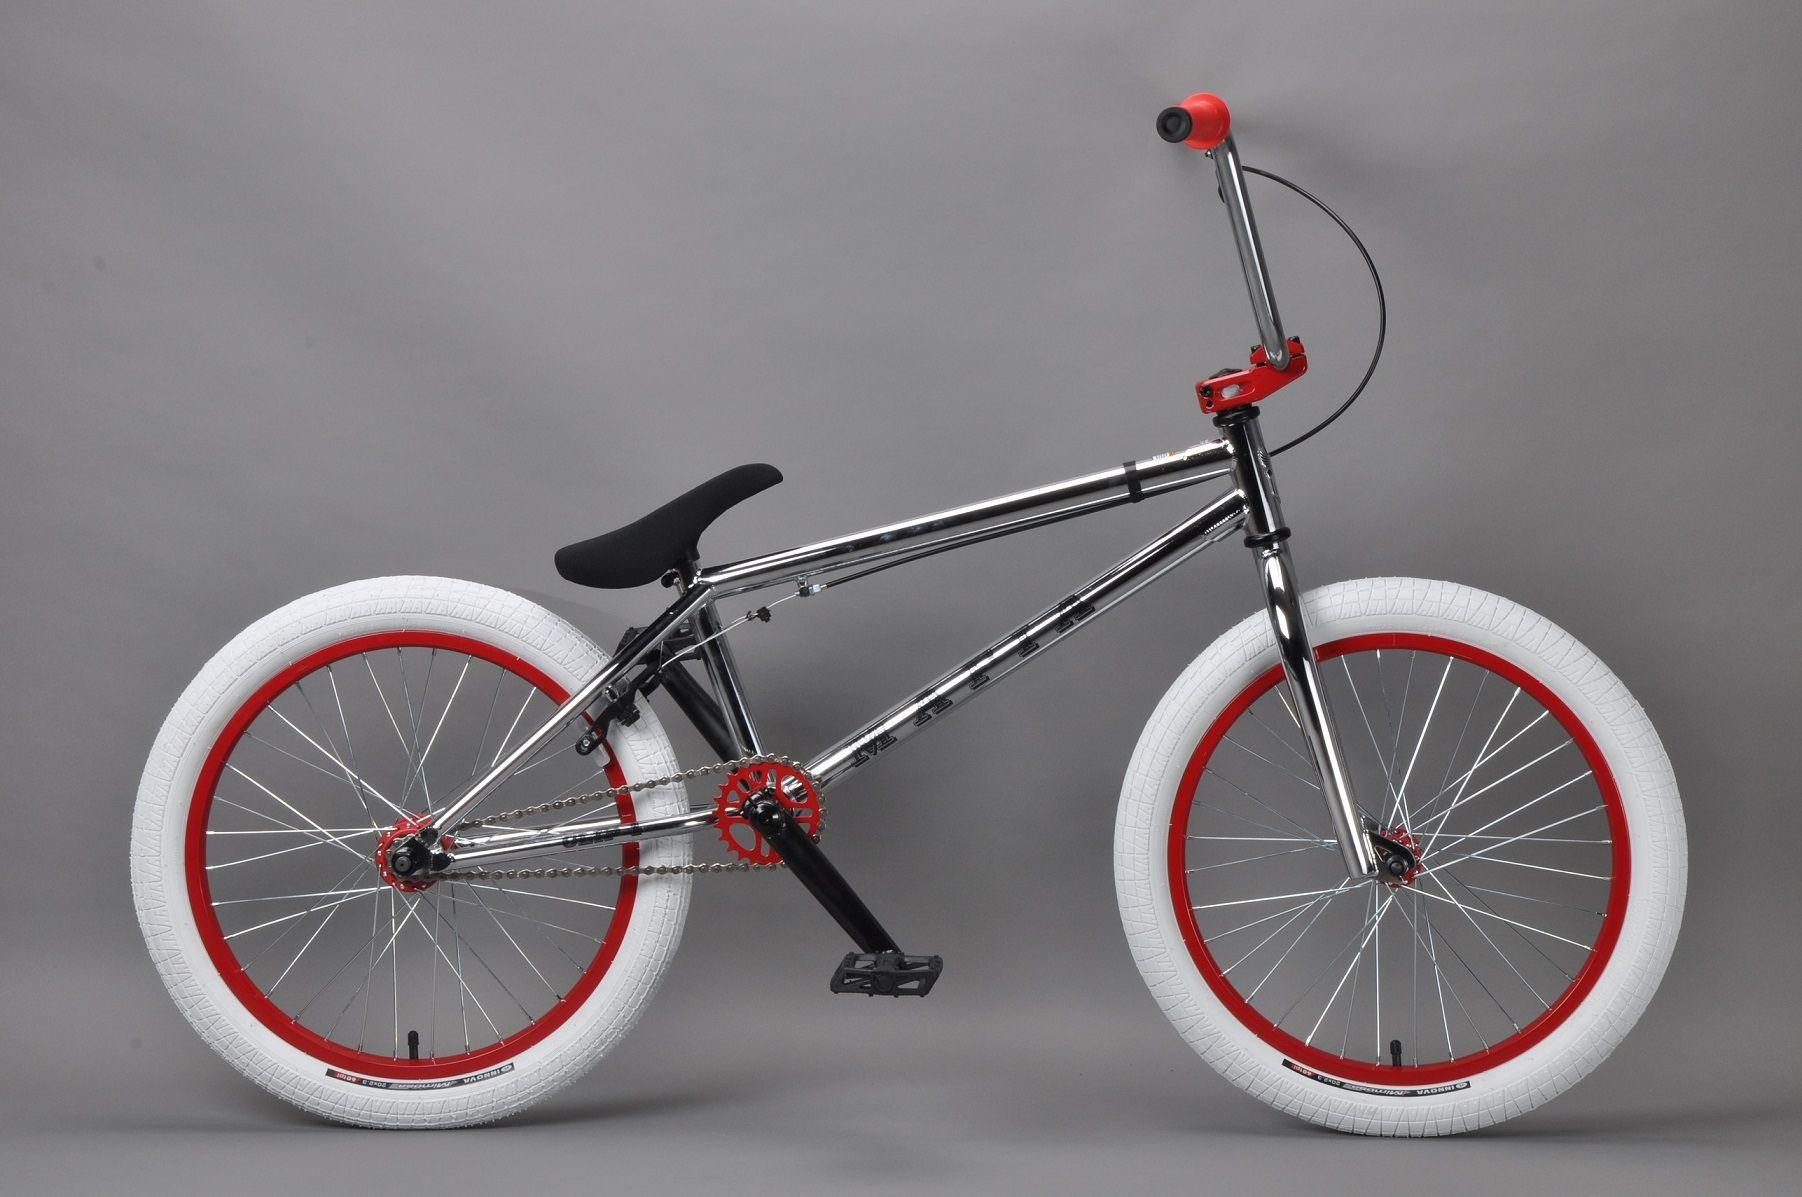 Mafiabikes Clip 20 Inch Bmx Bike Boys Girls Mafia Chrome All New 2015 Model Bmx Bikes Black Bmx Bike Bmx